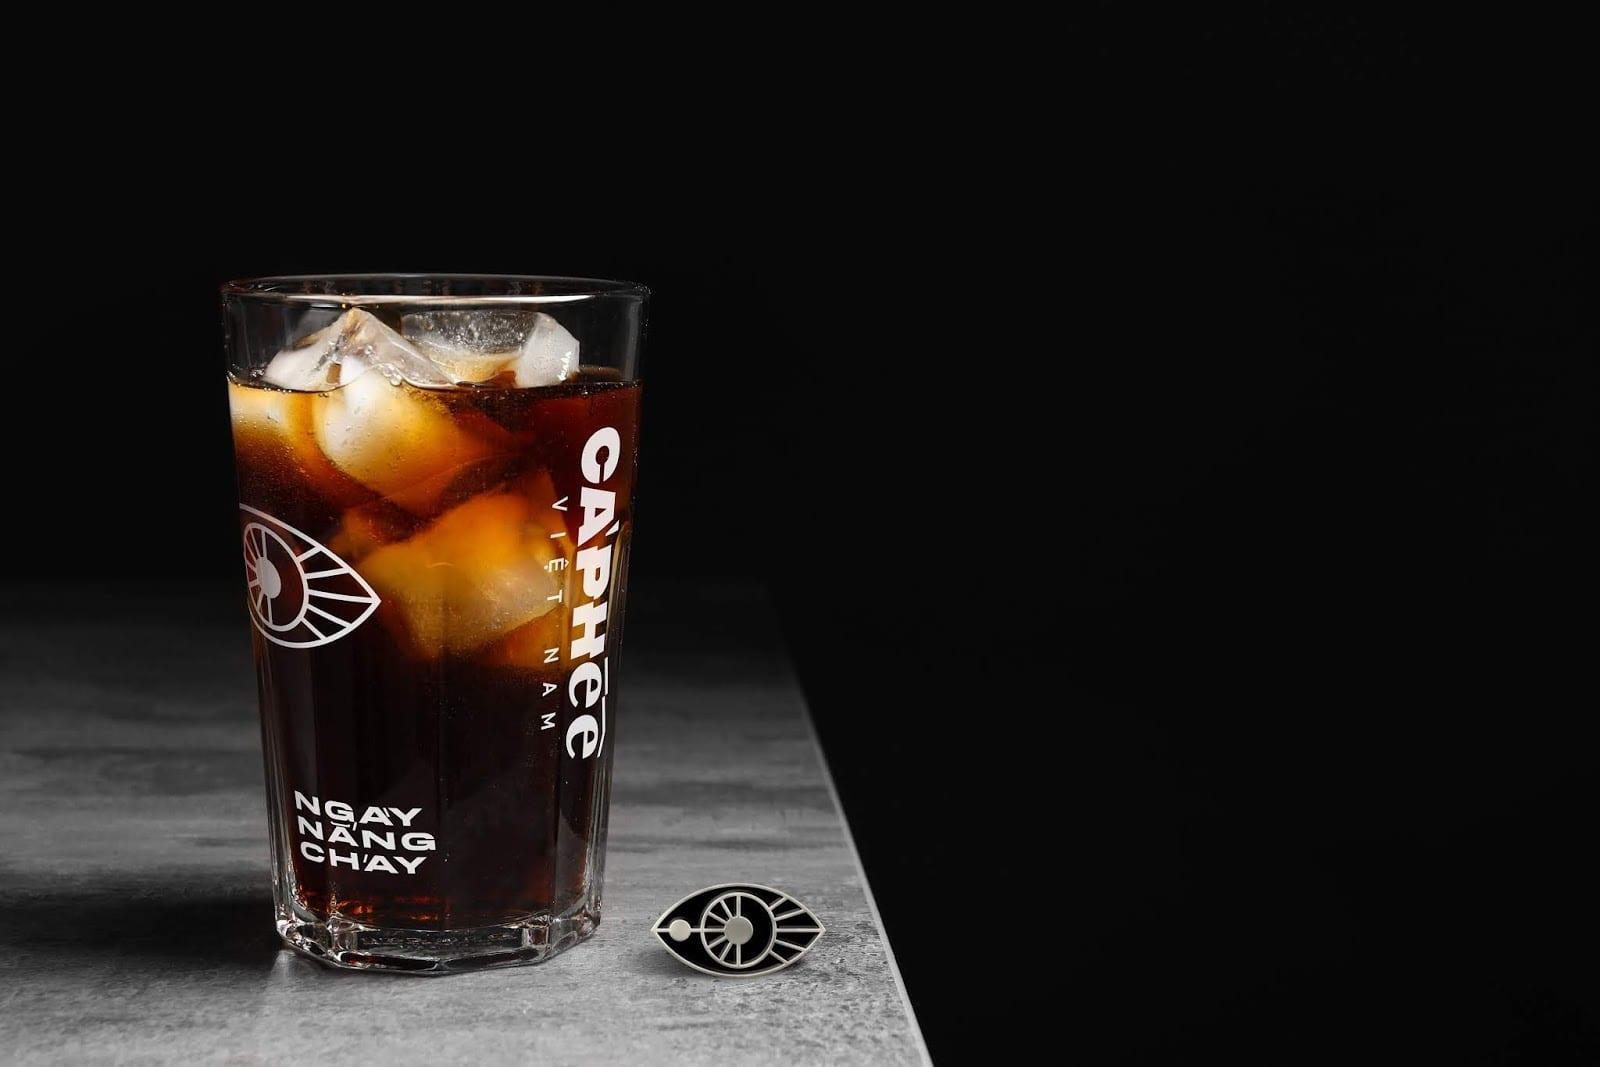 25 submit project tonbui - Ach, tie obaly - Cà phê Việt Nam Vietnam Coffee